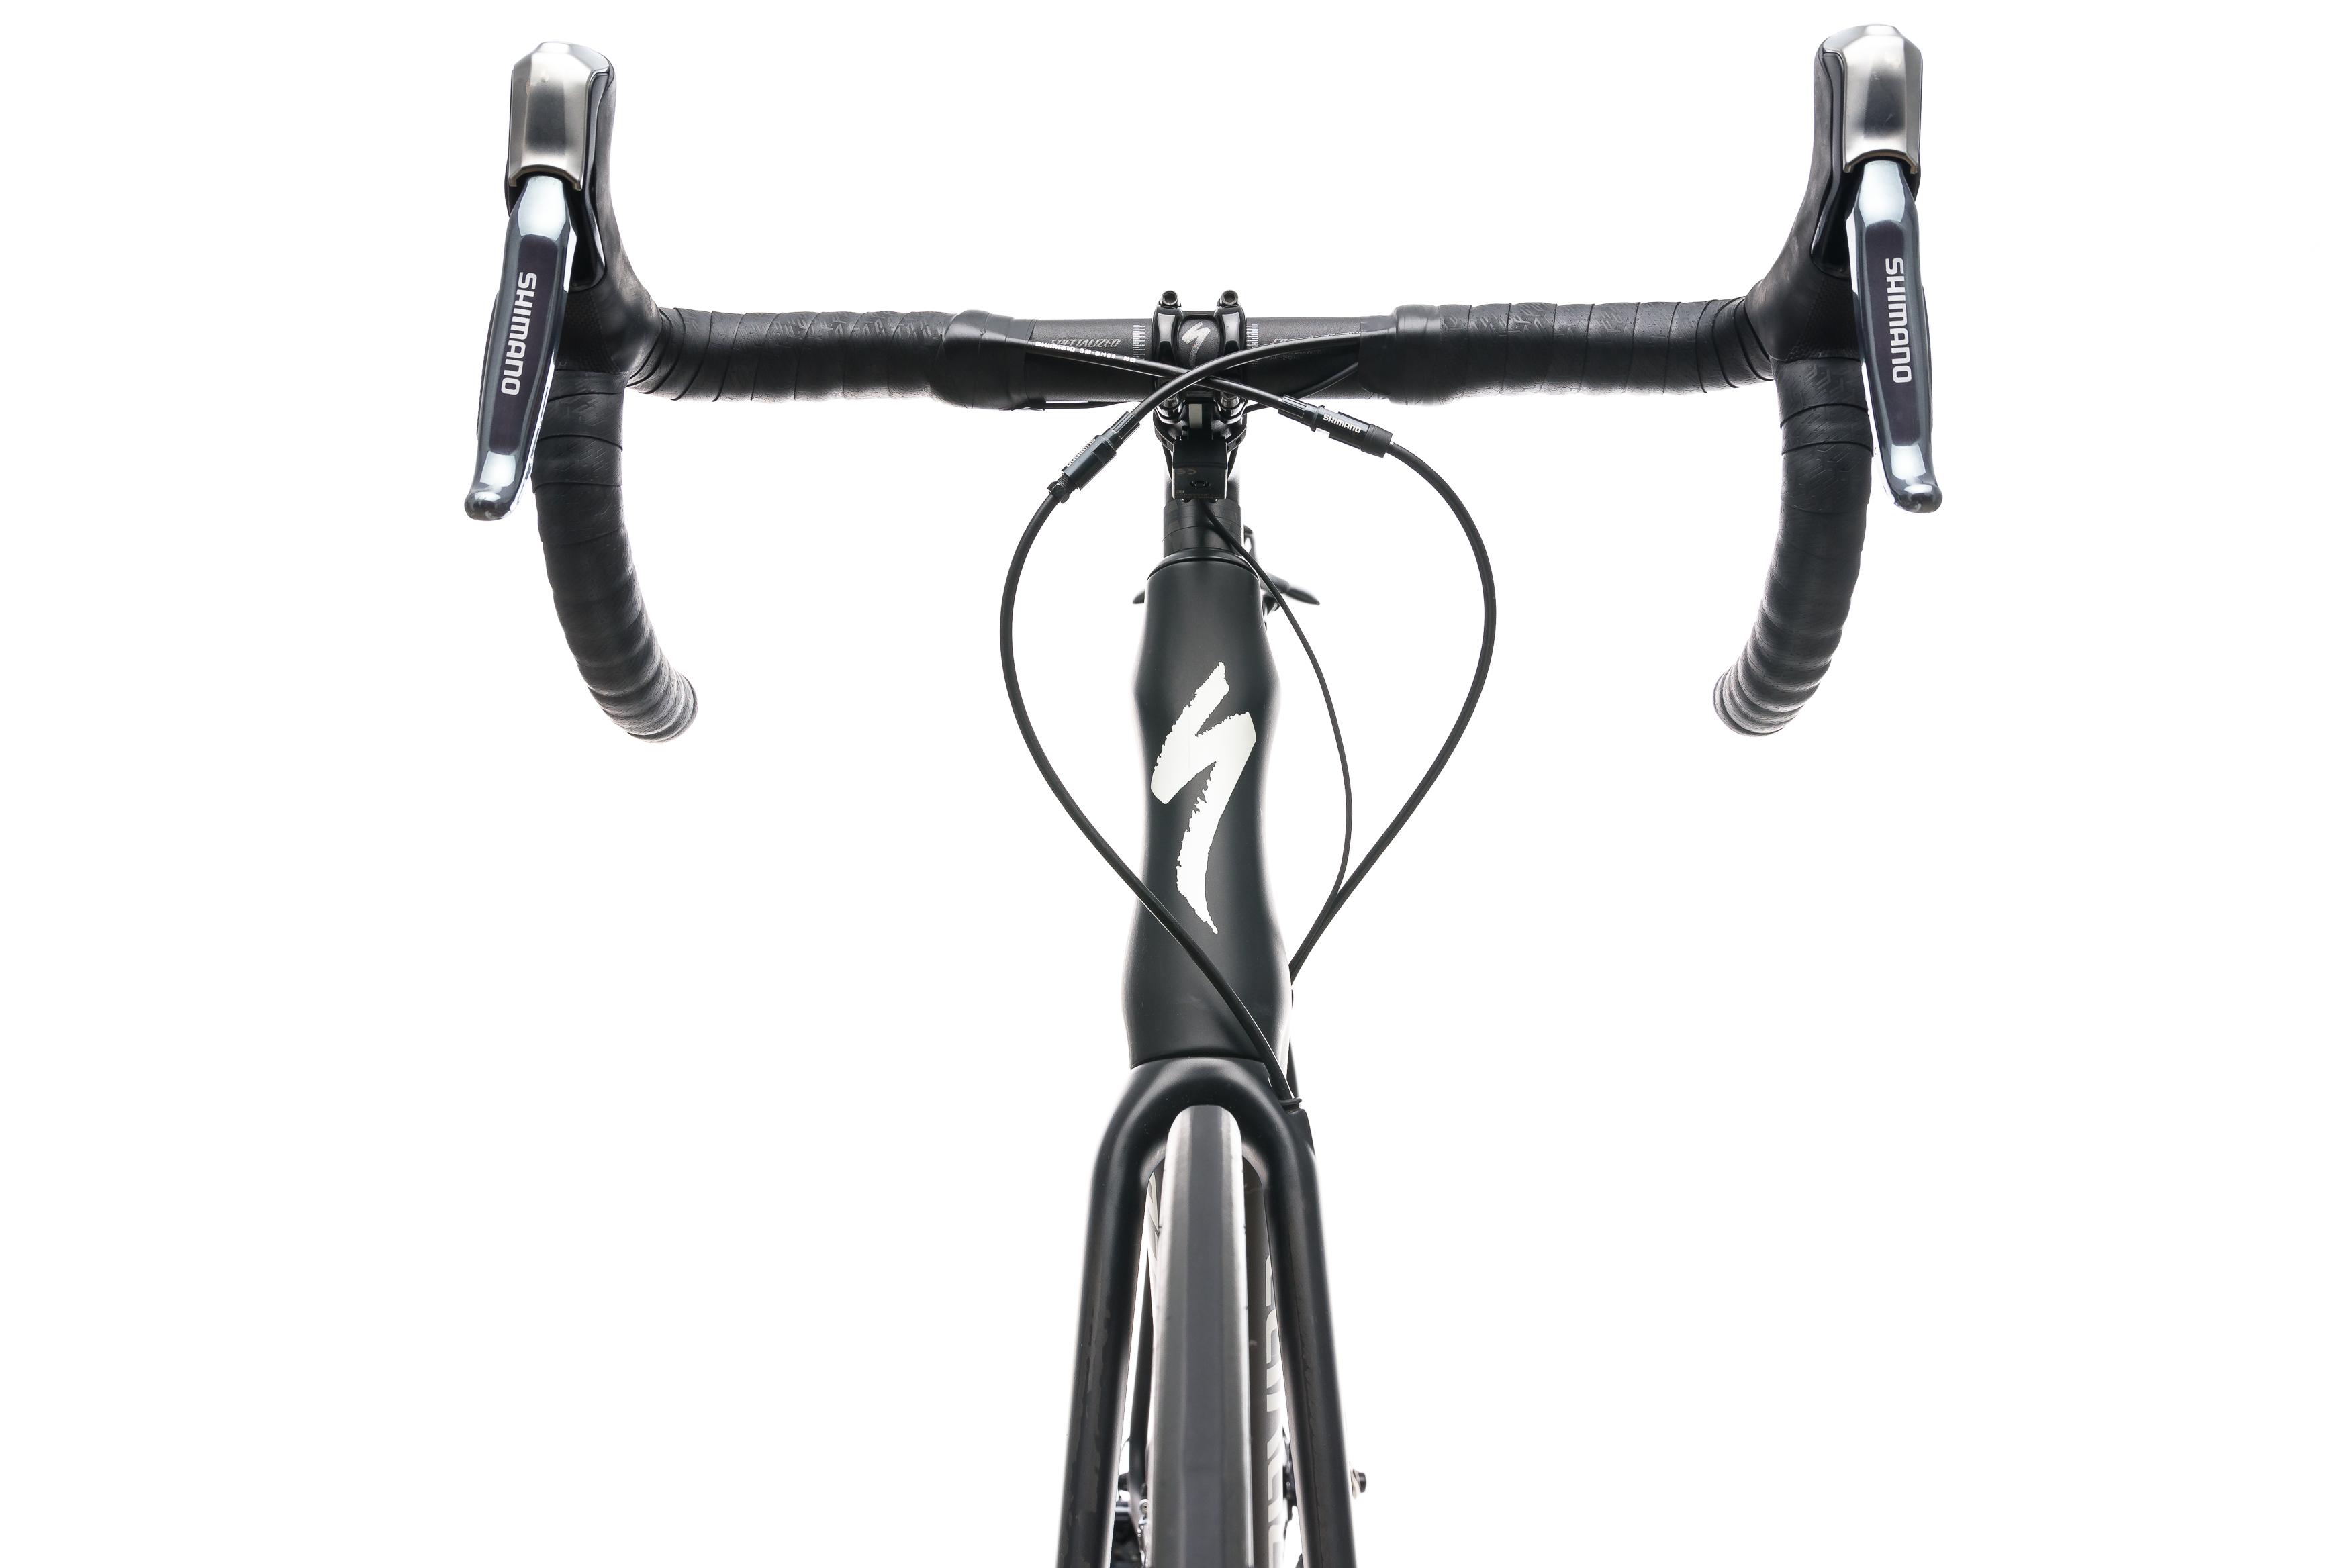 6e099186a83 2016 Specialized Tarmac Pro Race Disc Ultegra Di2 Road Bike 61cm X-Large  Carbon